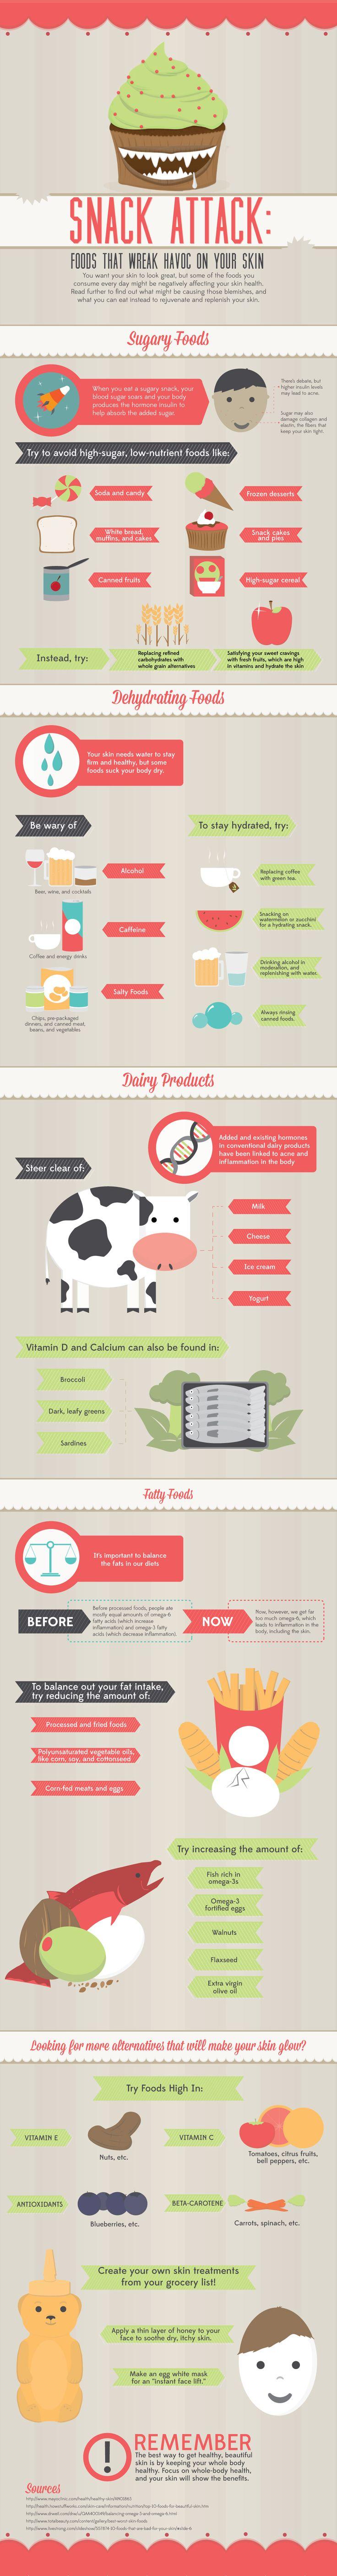 Snack Attack: Foods that Wreak Havoc on Your Skin